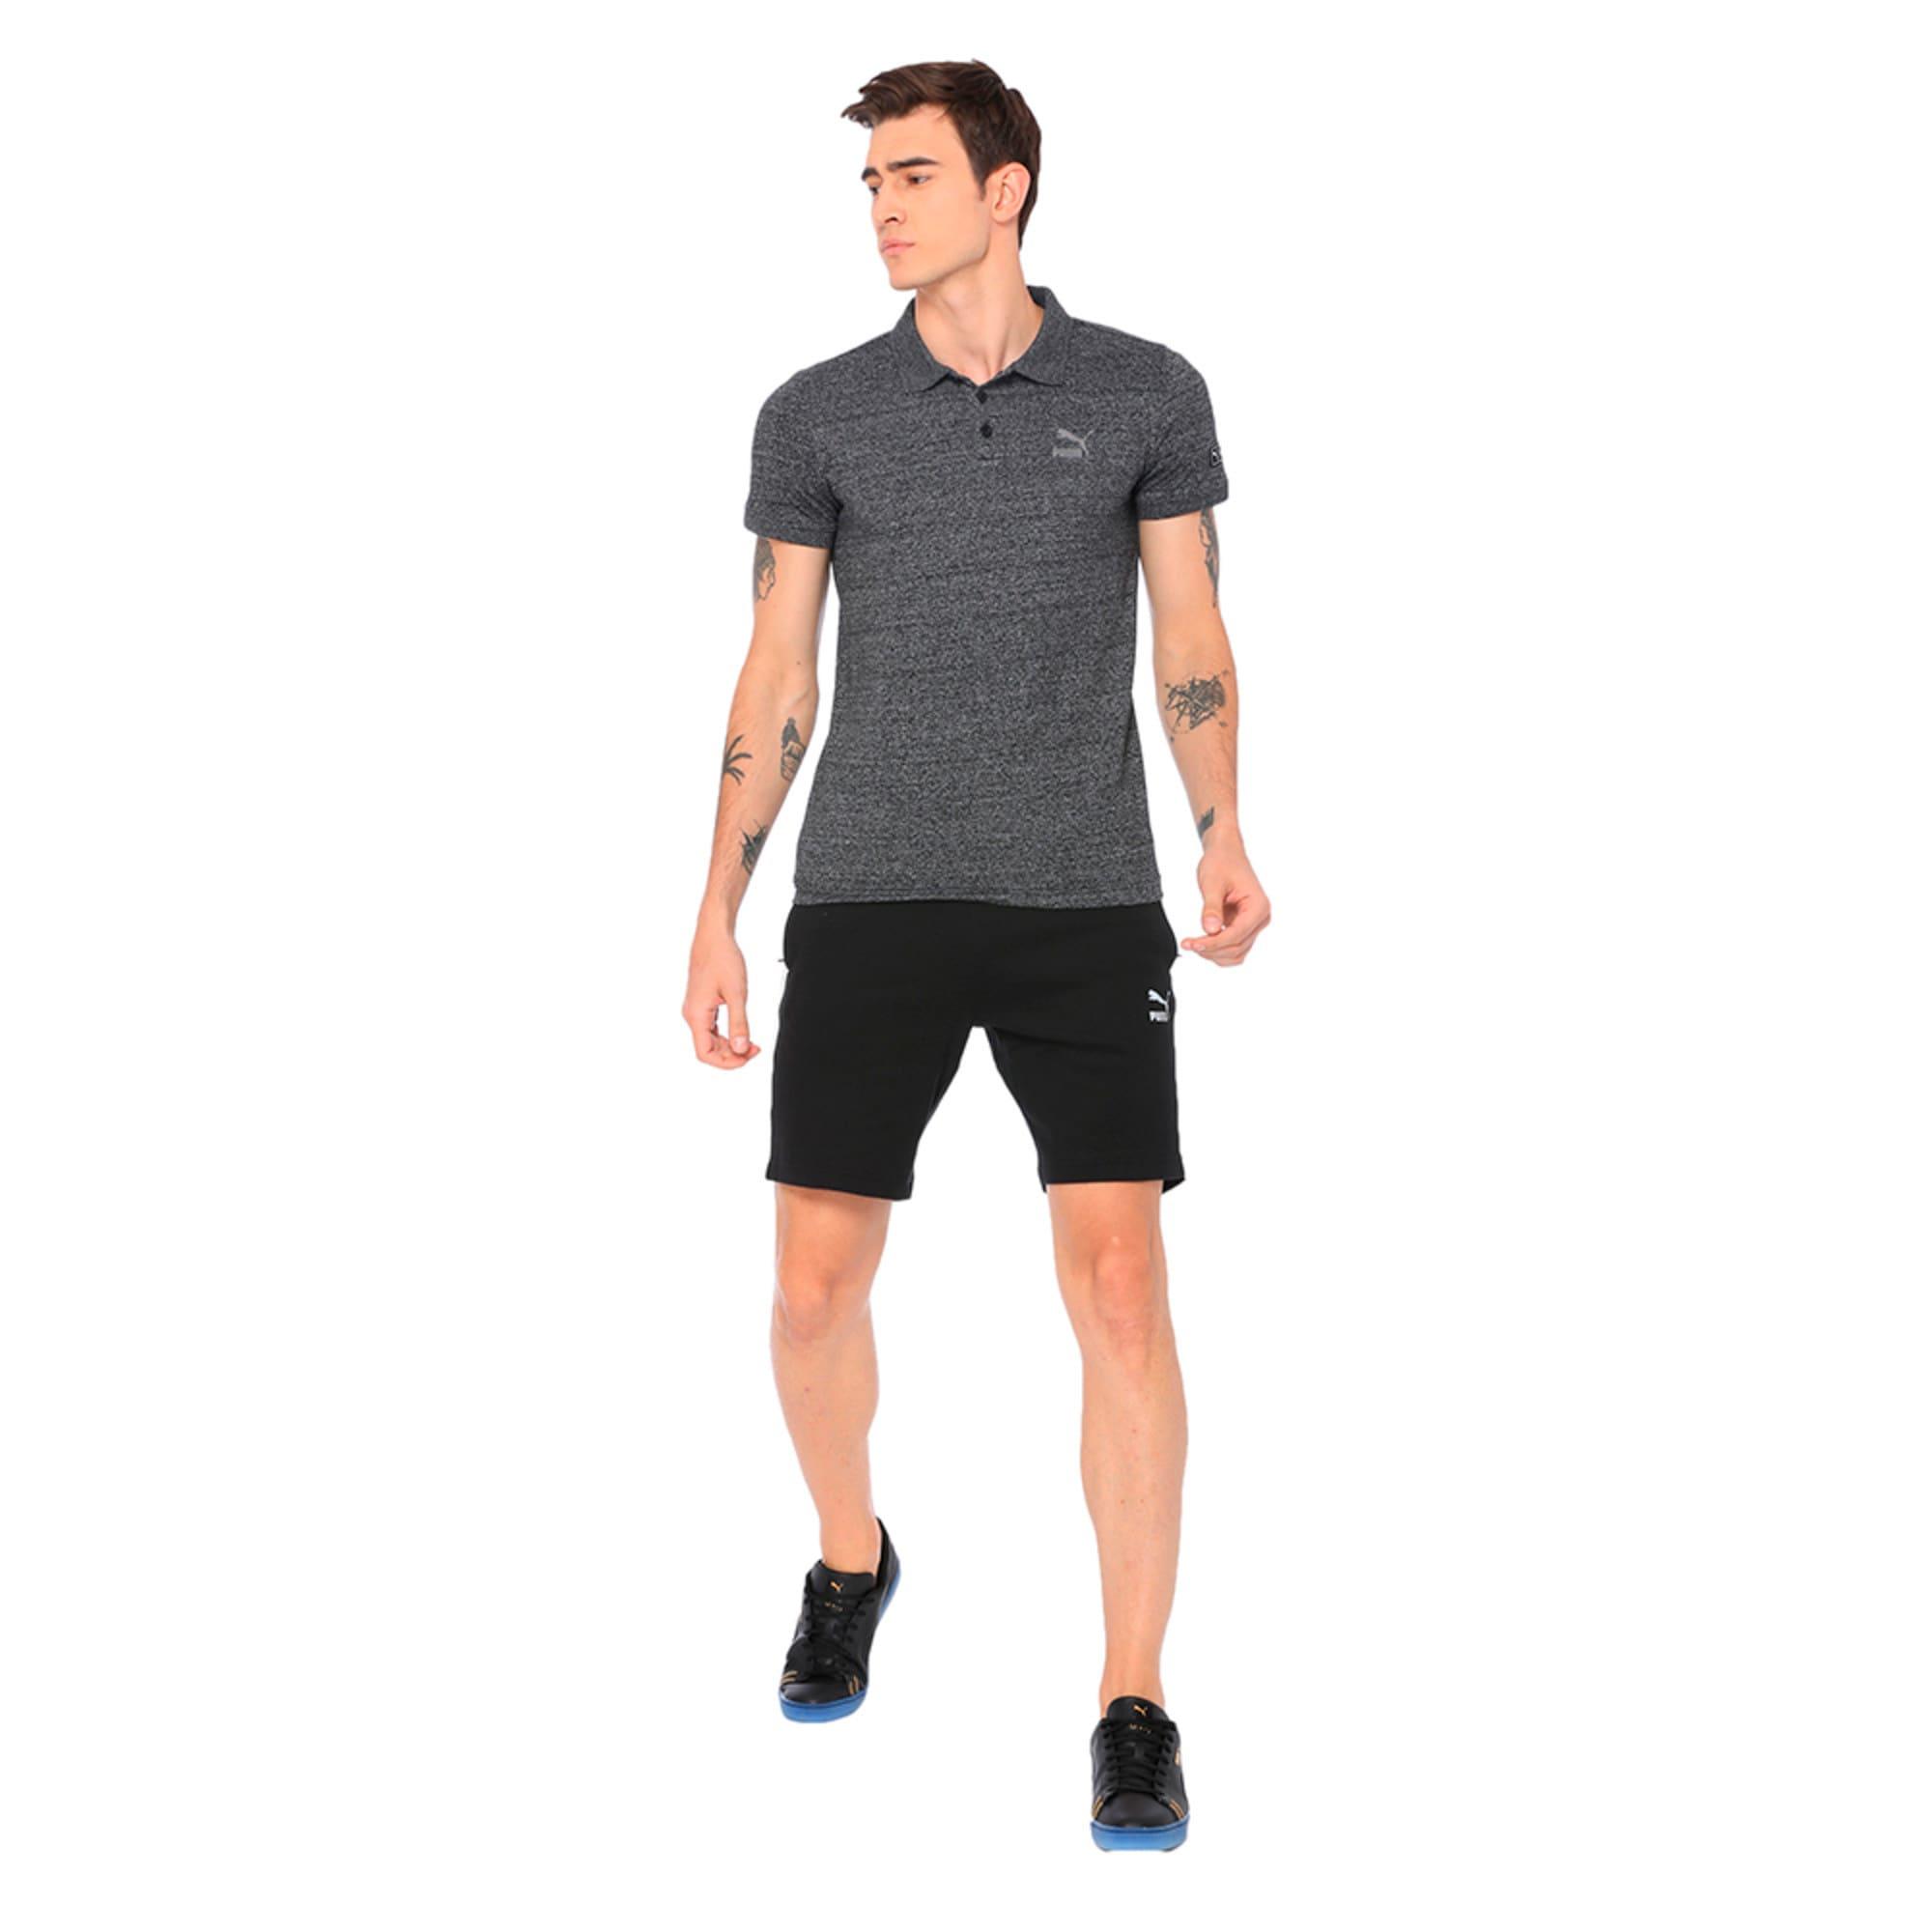 Thumbnail 1 of VK Sweat Shorts, Puma Black, medium-IND